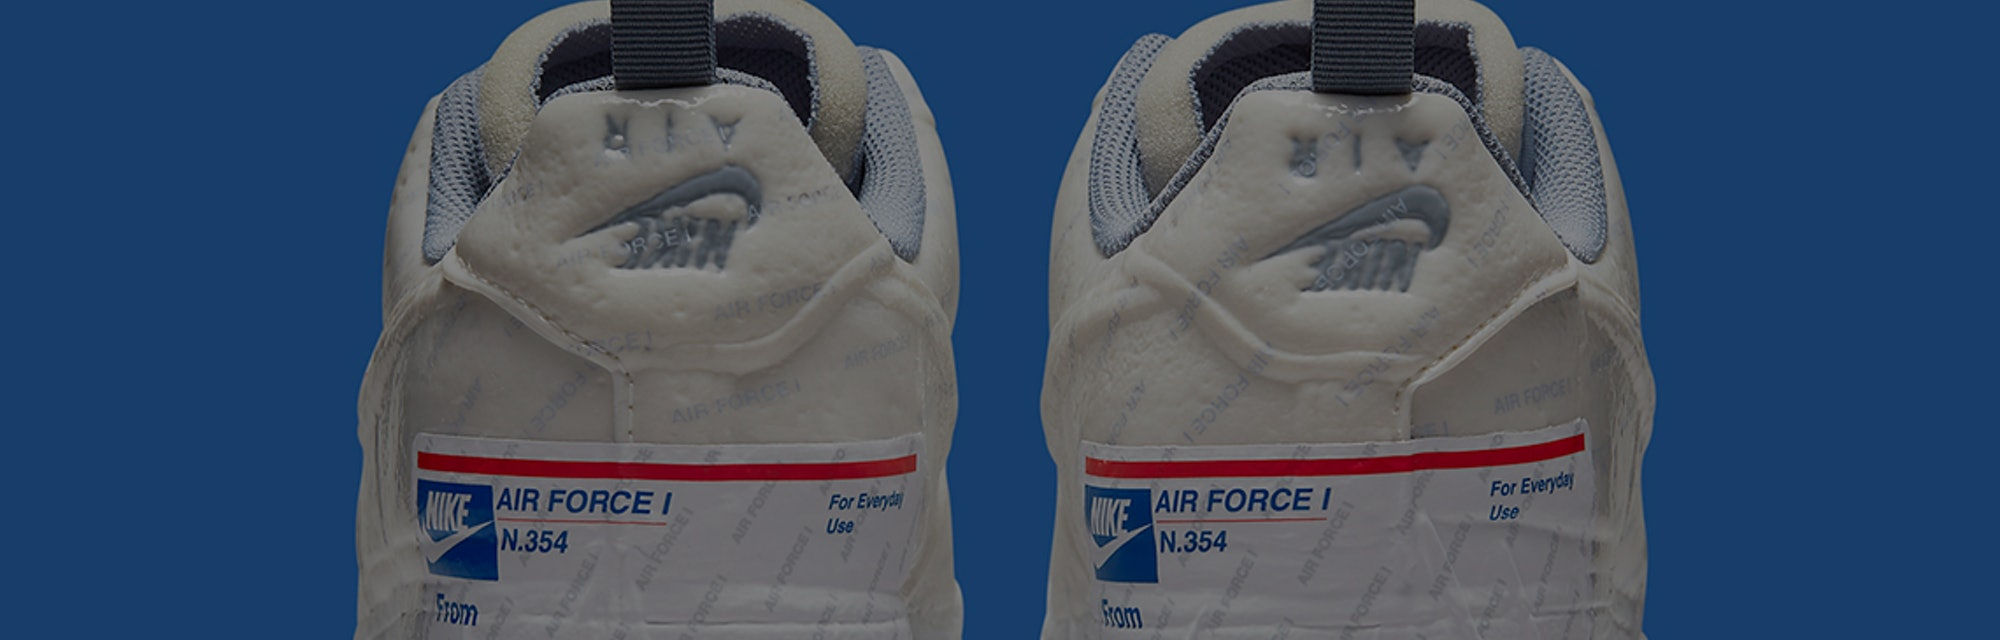 AIR FORCE 1 LOW EXPERIMENTAL 'PARCEL SERVICE'